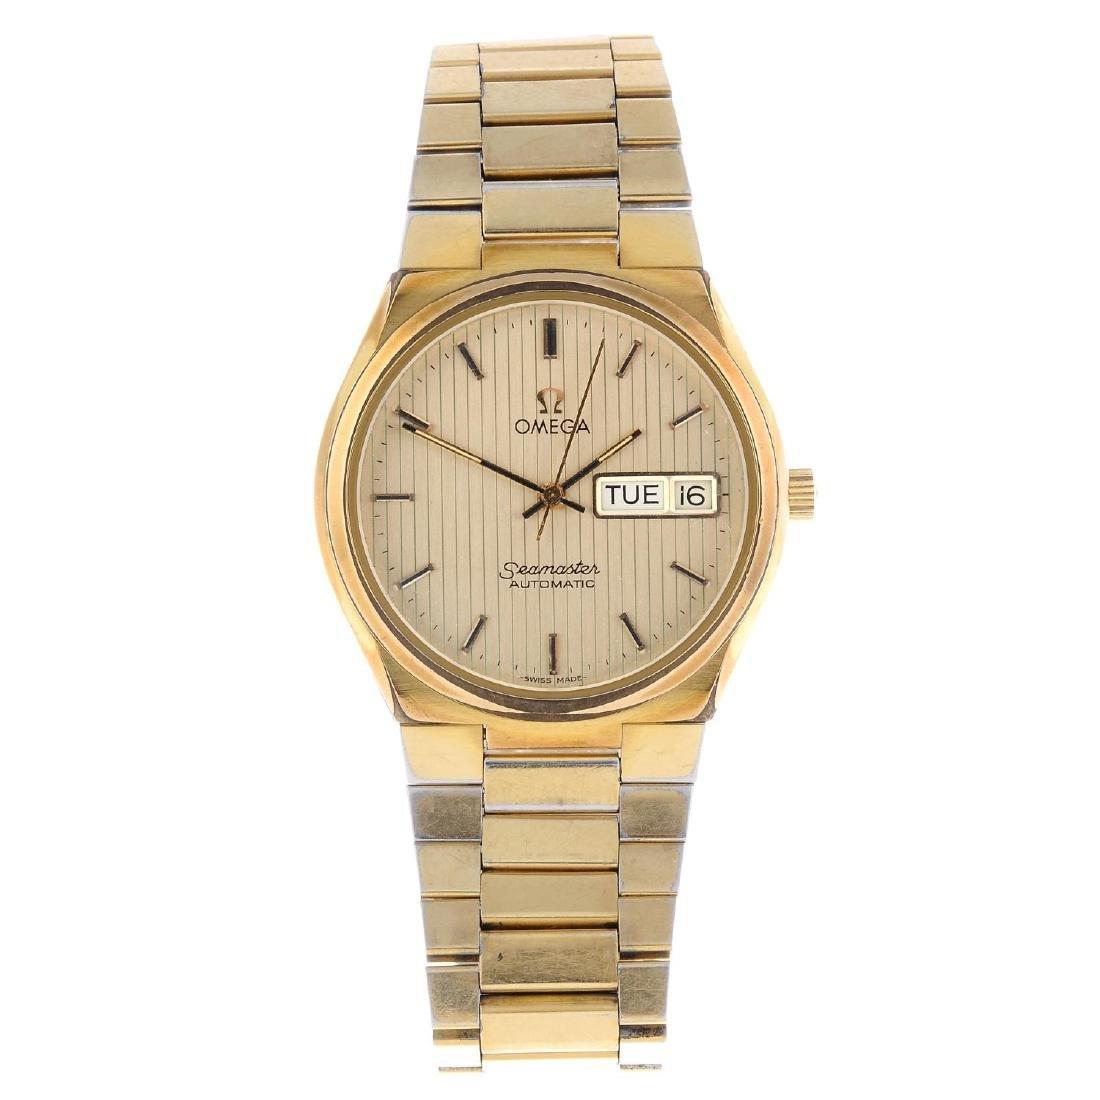 OMEGA - a gentleman's Seamaster bracelet watch. Gold